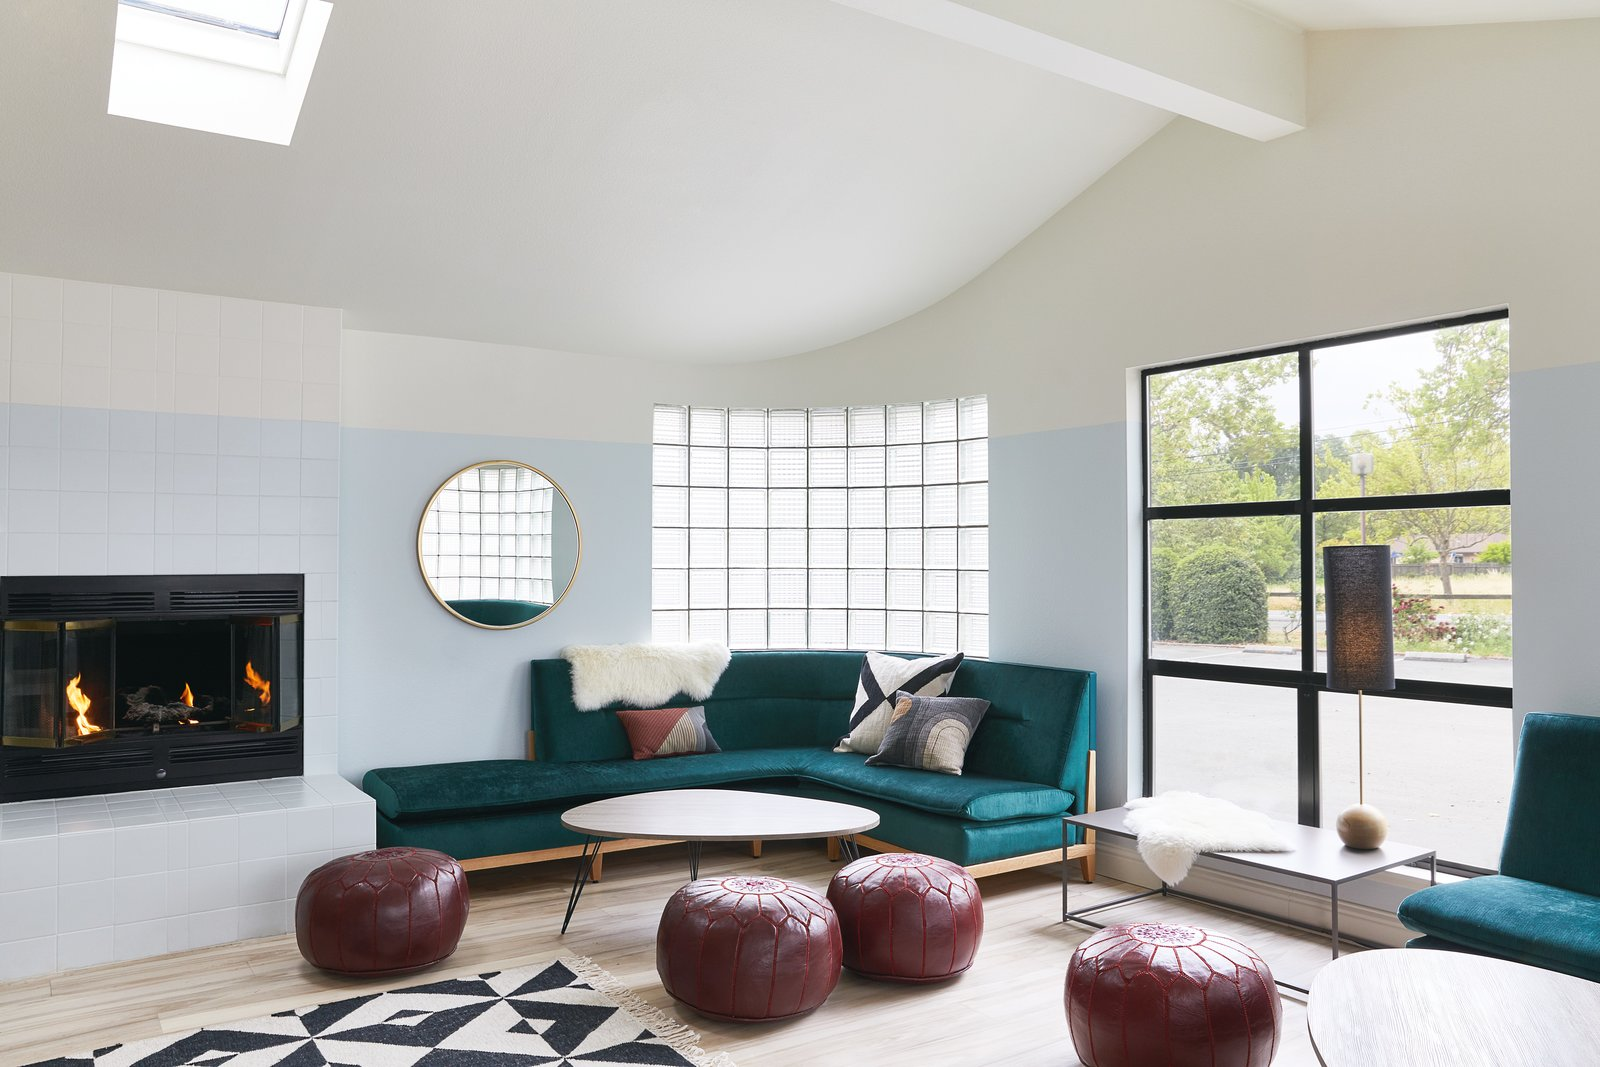 These 5 Interior Design Trends Will Reign Supreme In 2018